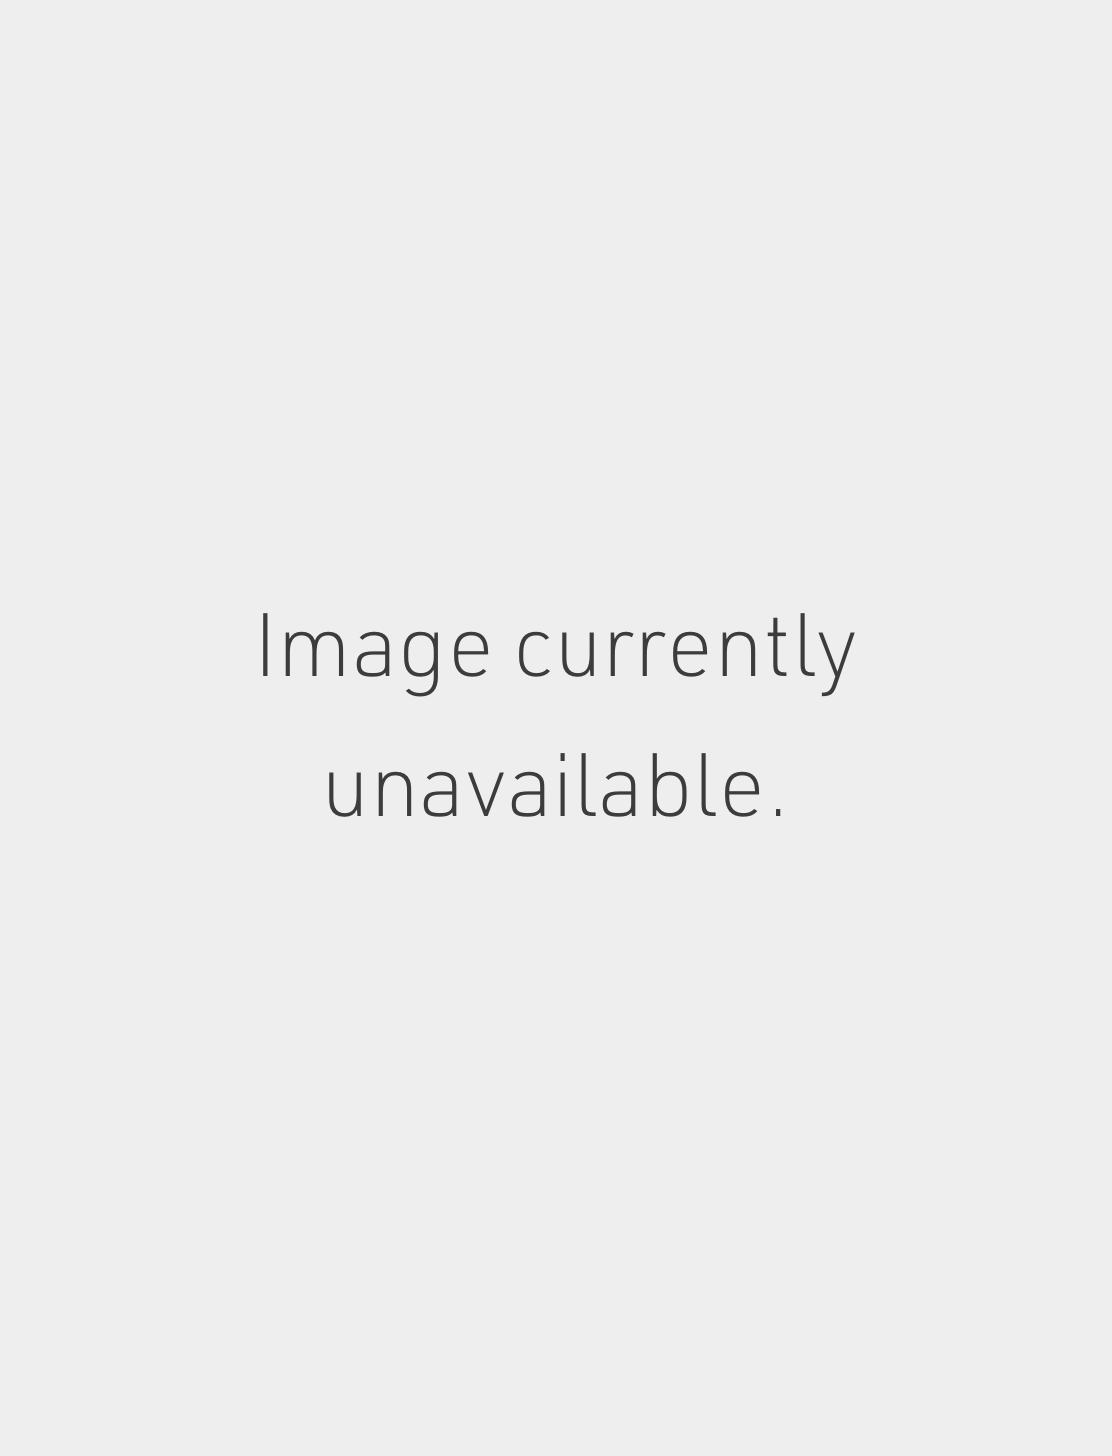 Dala Dangle and Ultra Barbell Image #1